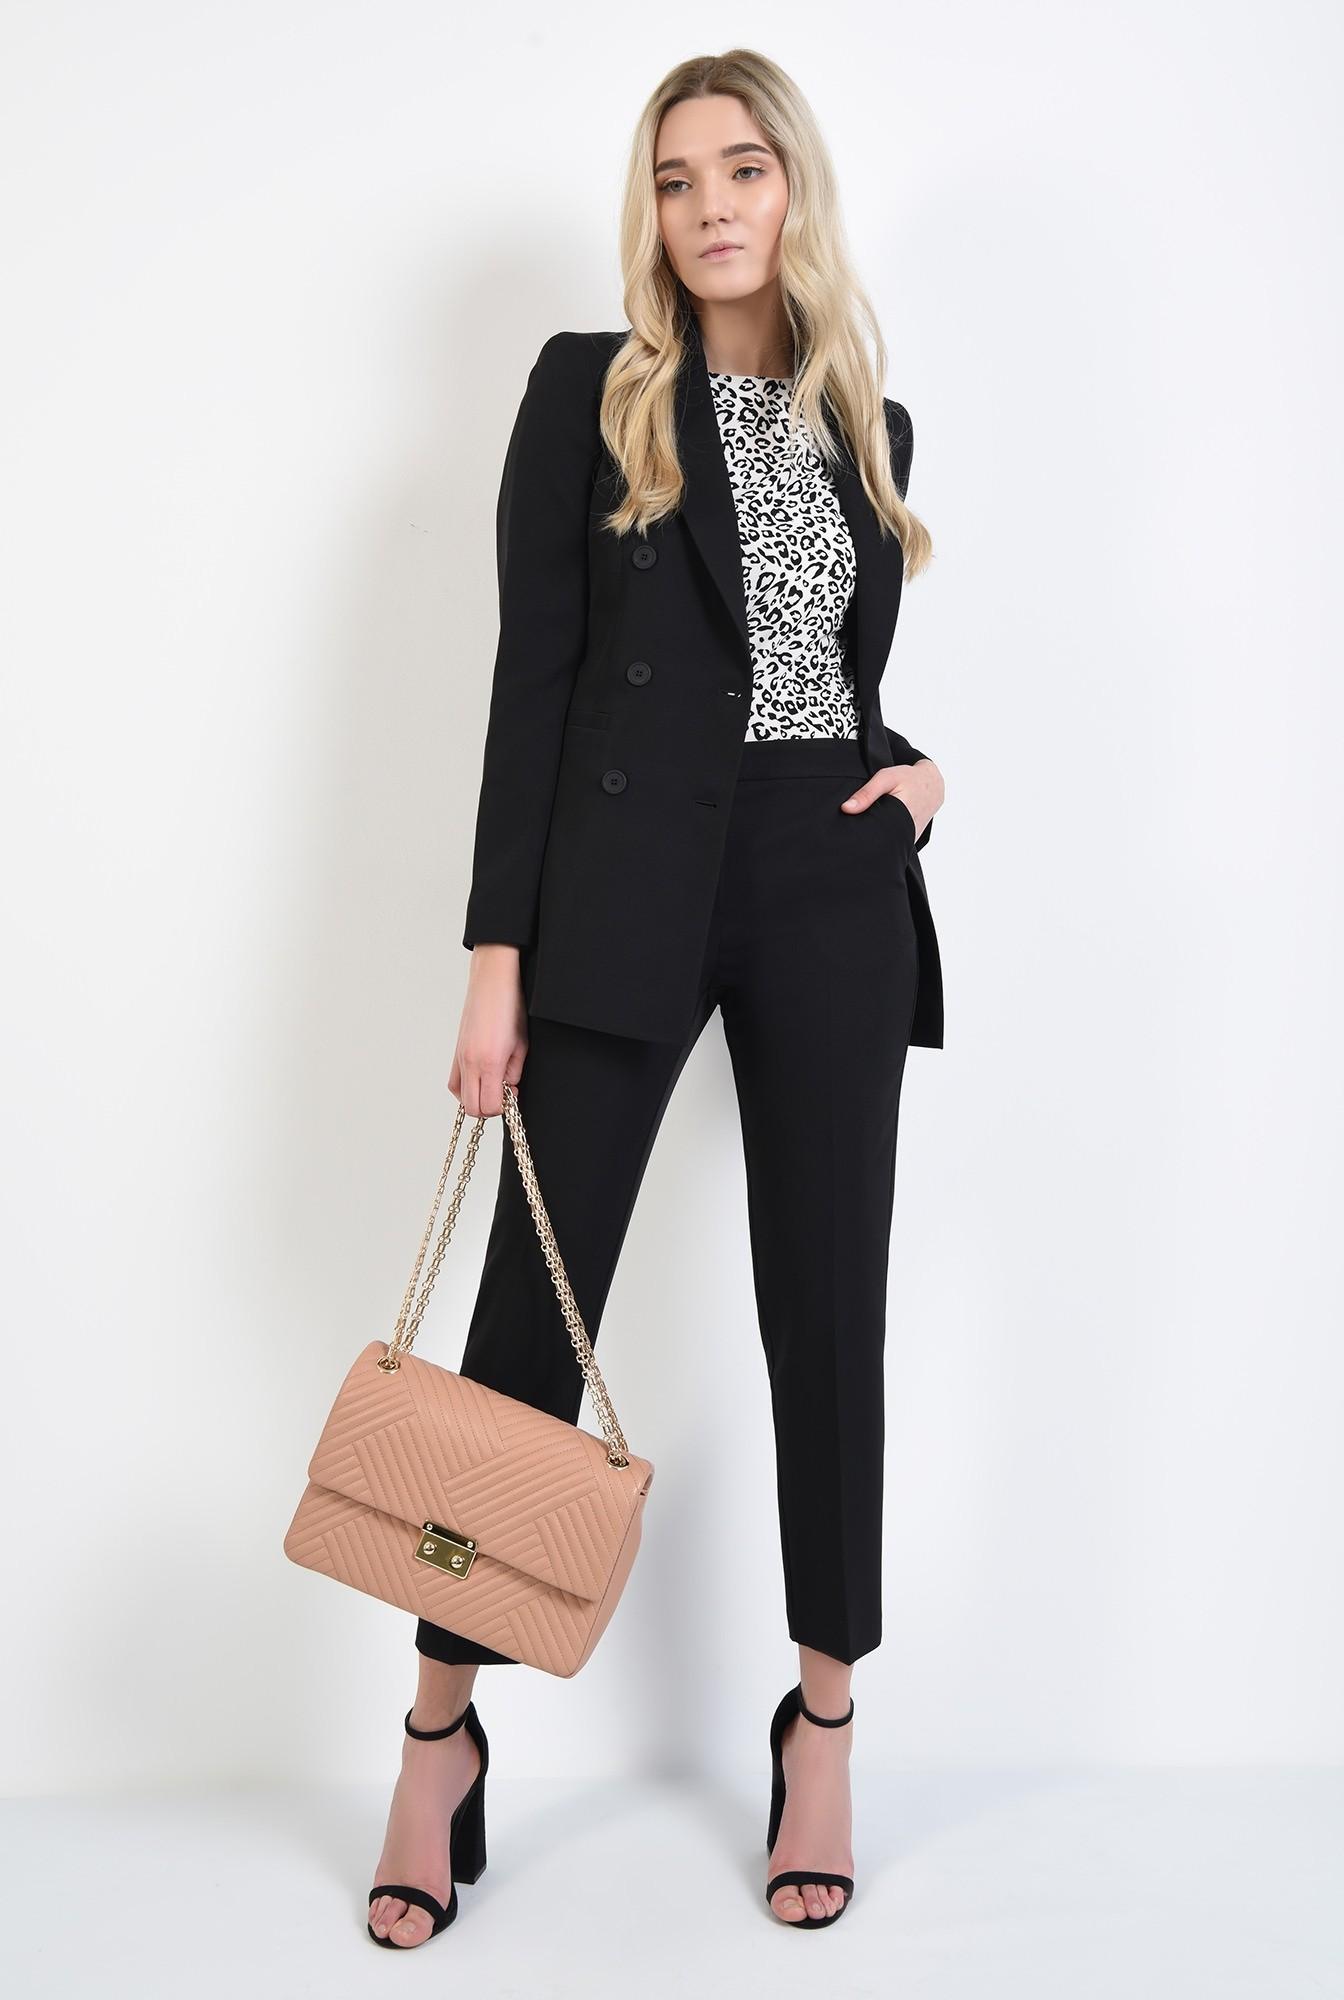 2 - pantaloni de zi, negri, lungi, croi tigareta